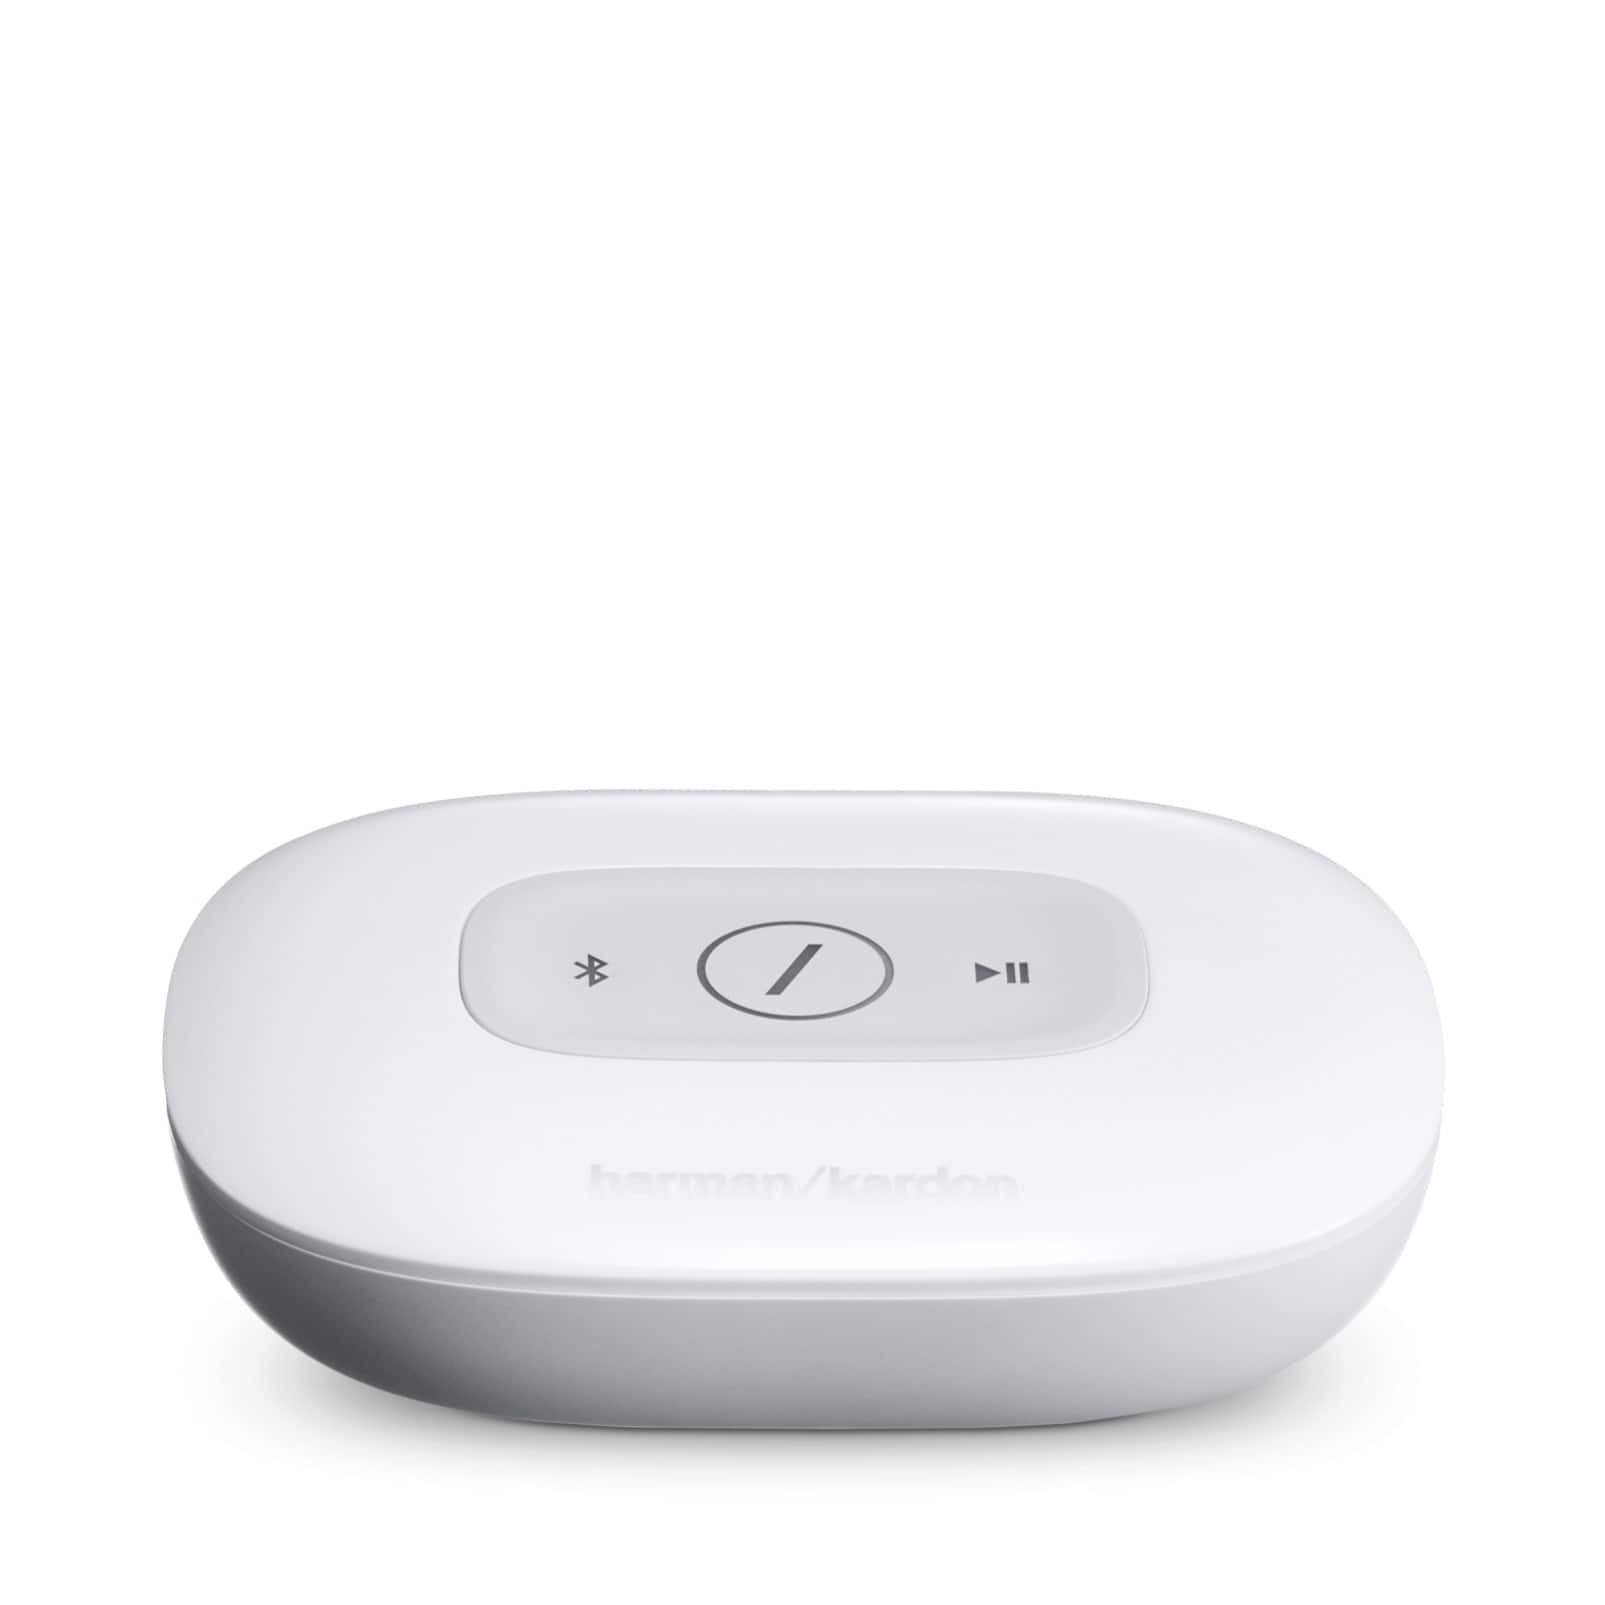 Harman Kardon Adapt HD Audio Wireless Adaptor with Bluetooth (Black or White) $12.95 + Free Shipping